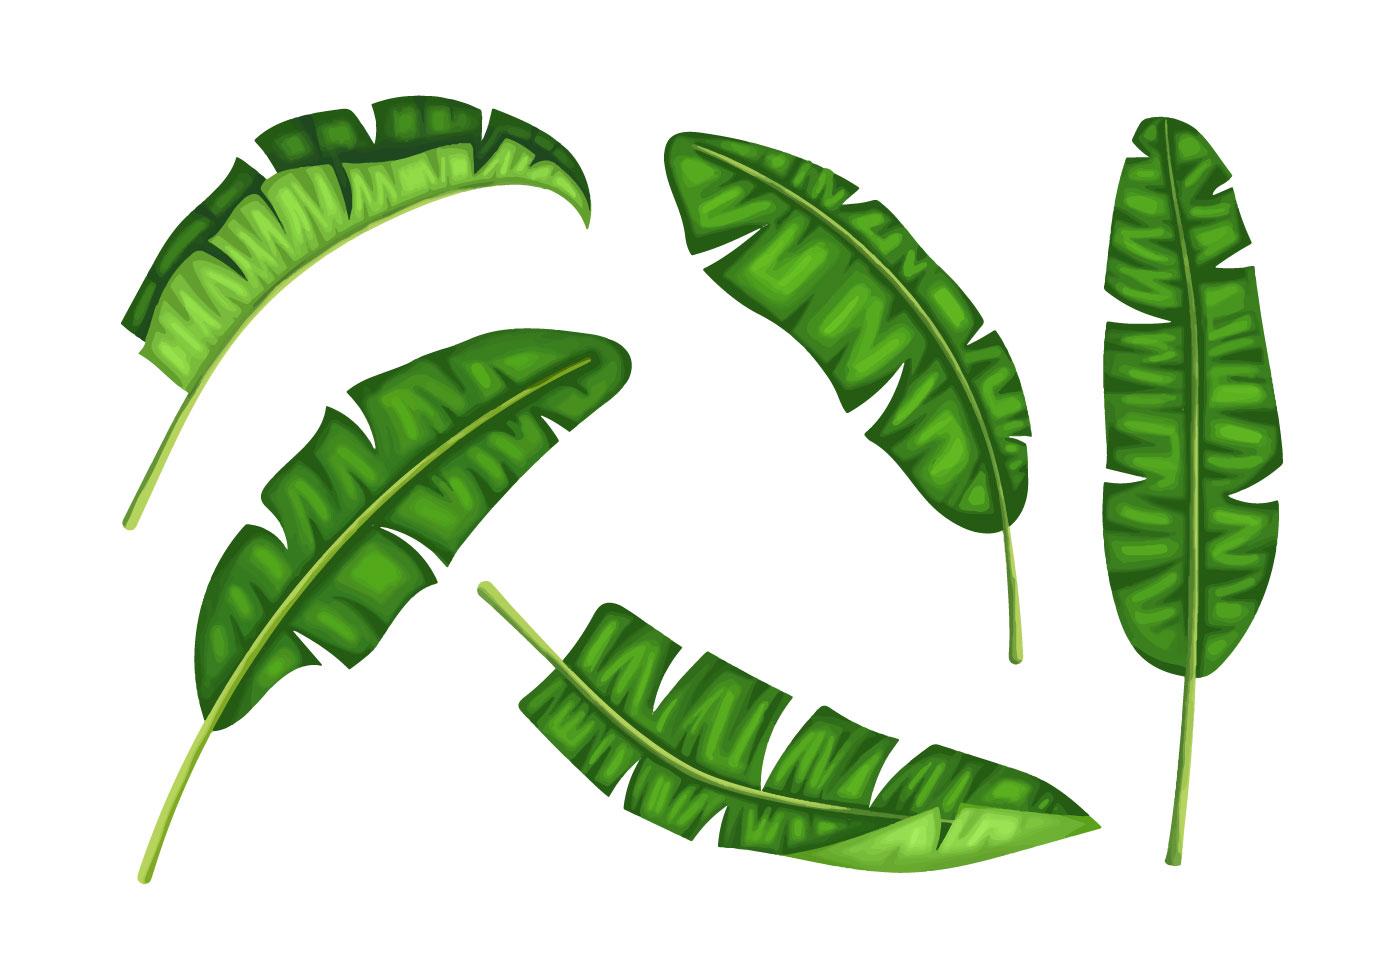 Banana Plantain Leaves Illustration Vector - Download Free ...